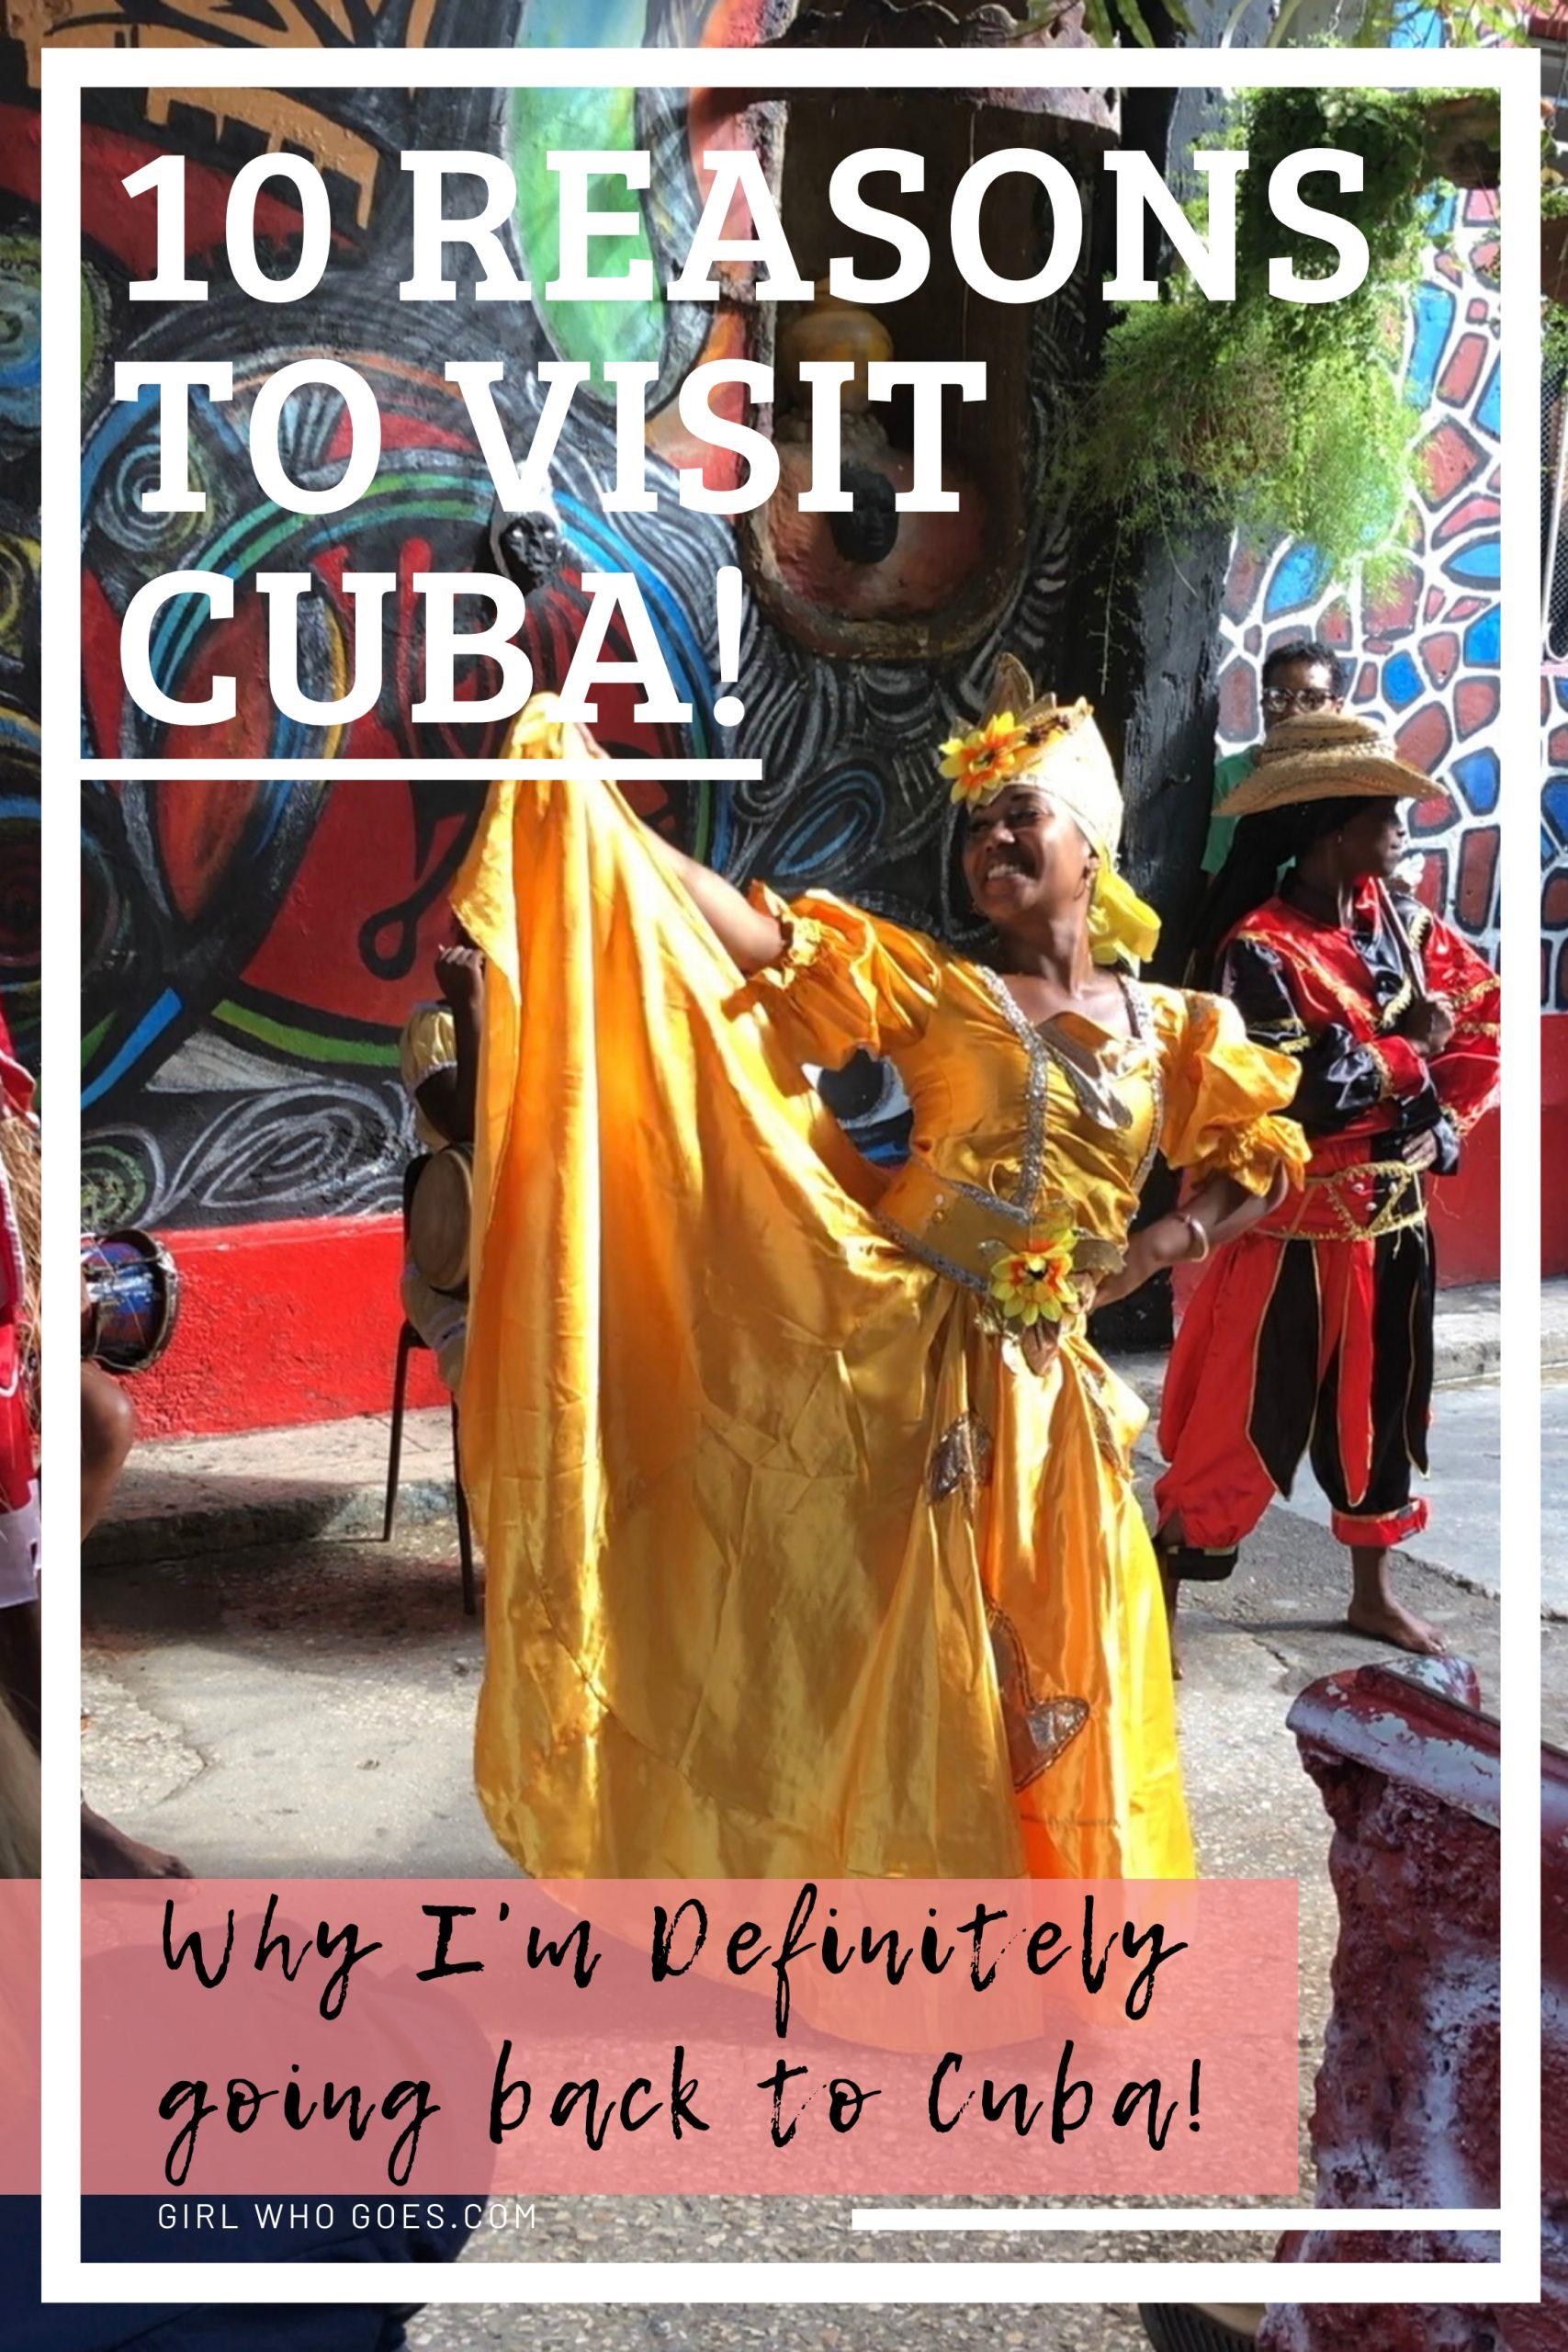 10 Reasons I'm Definitely Going Back to Cuba